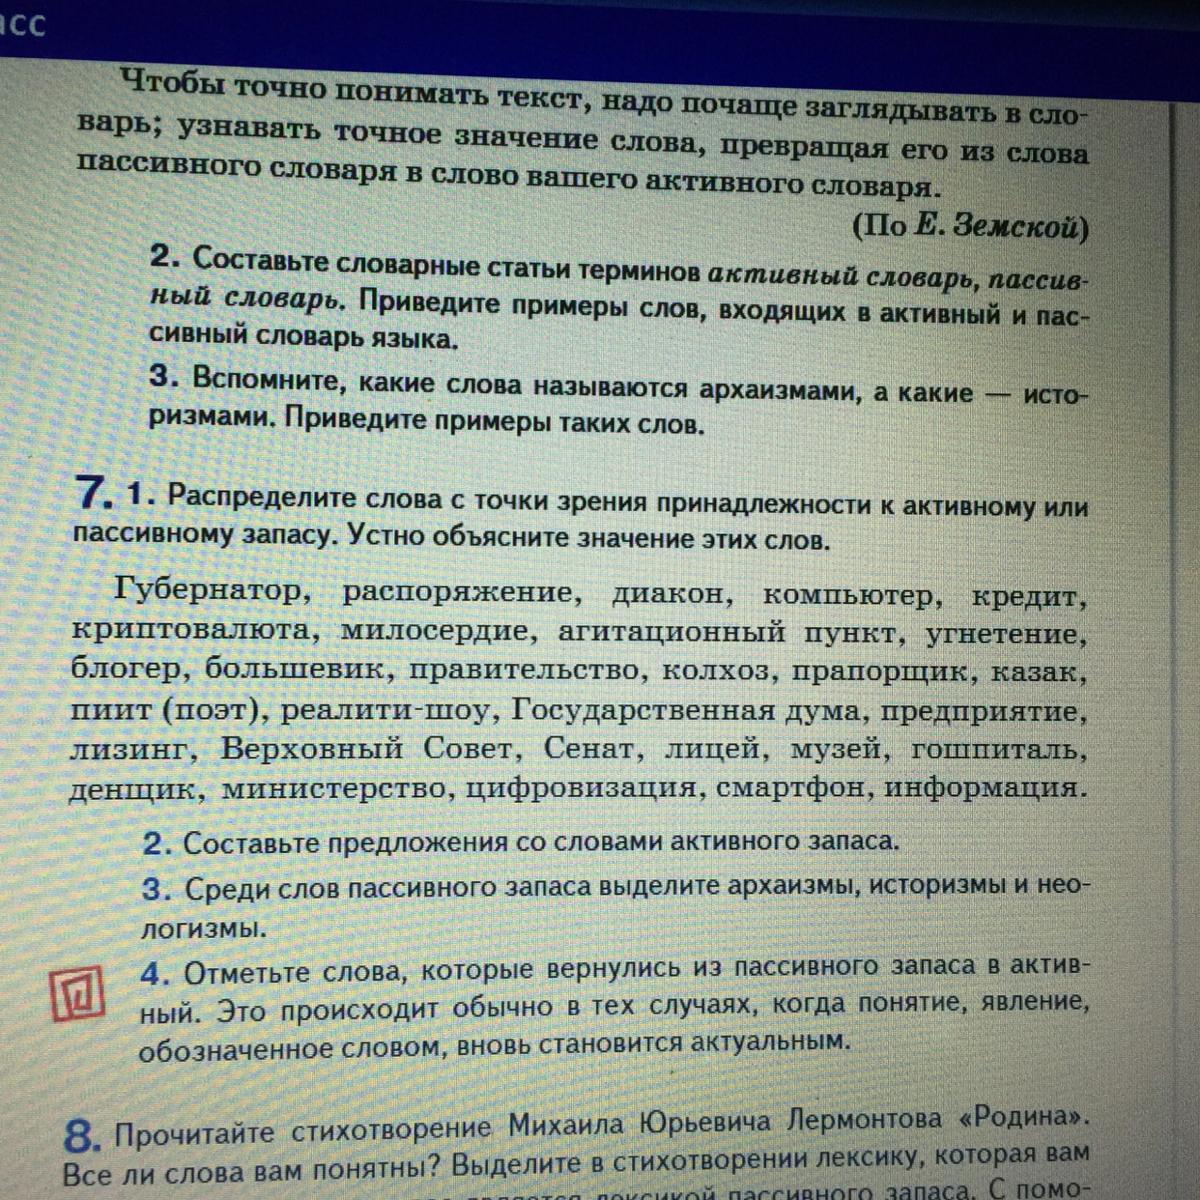 стихотворение про кредит хоум кредит банк форум банки ру